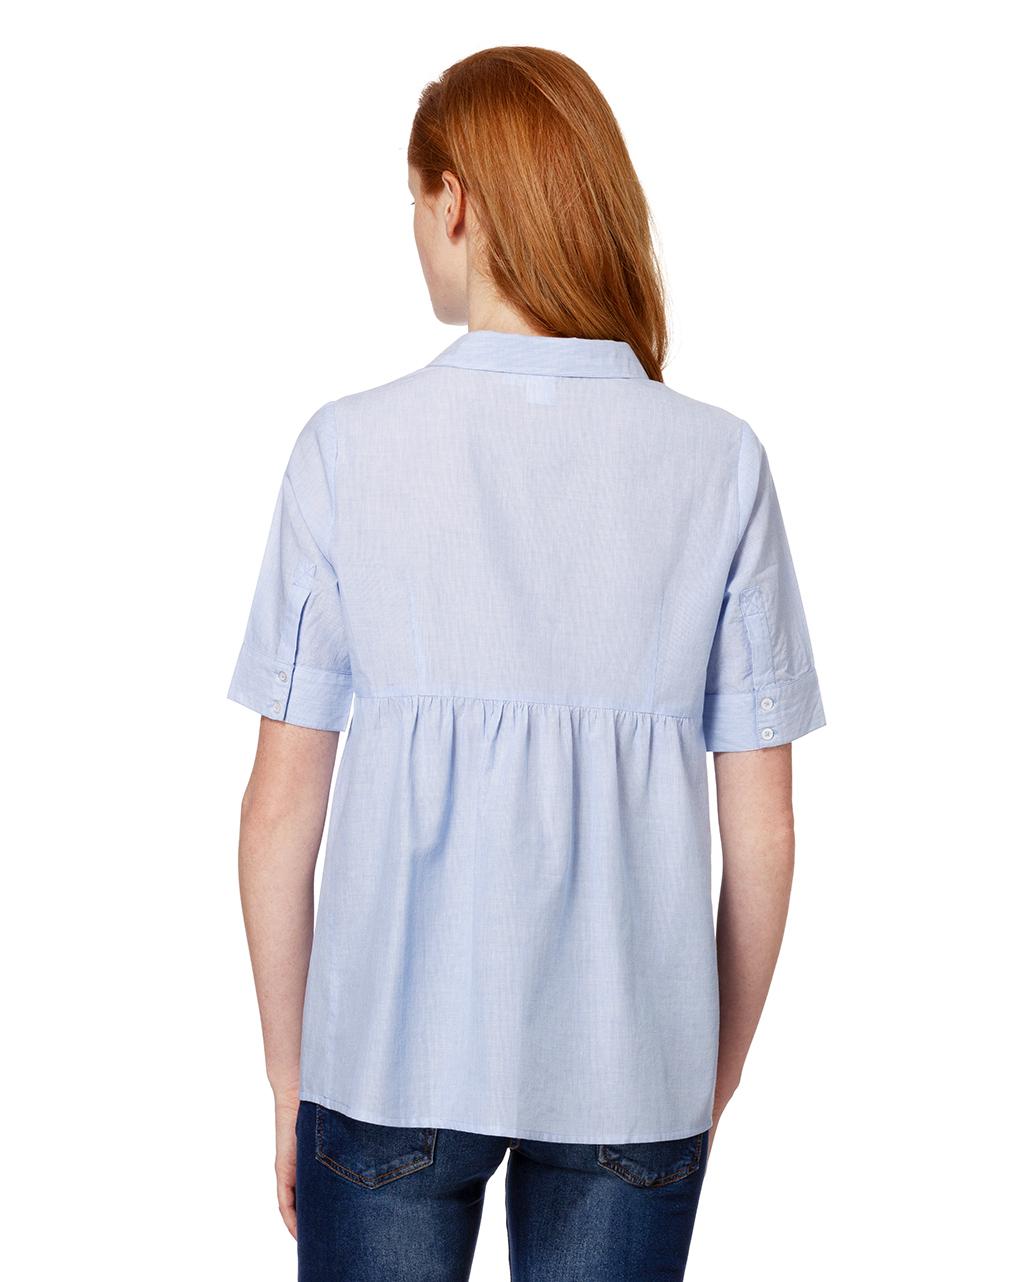 Camicia millerighe azzurre a maniche corte - Prénatal